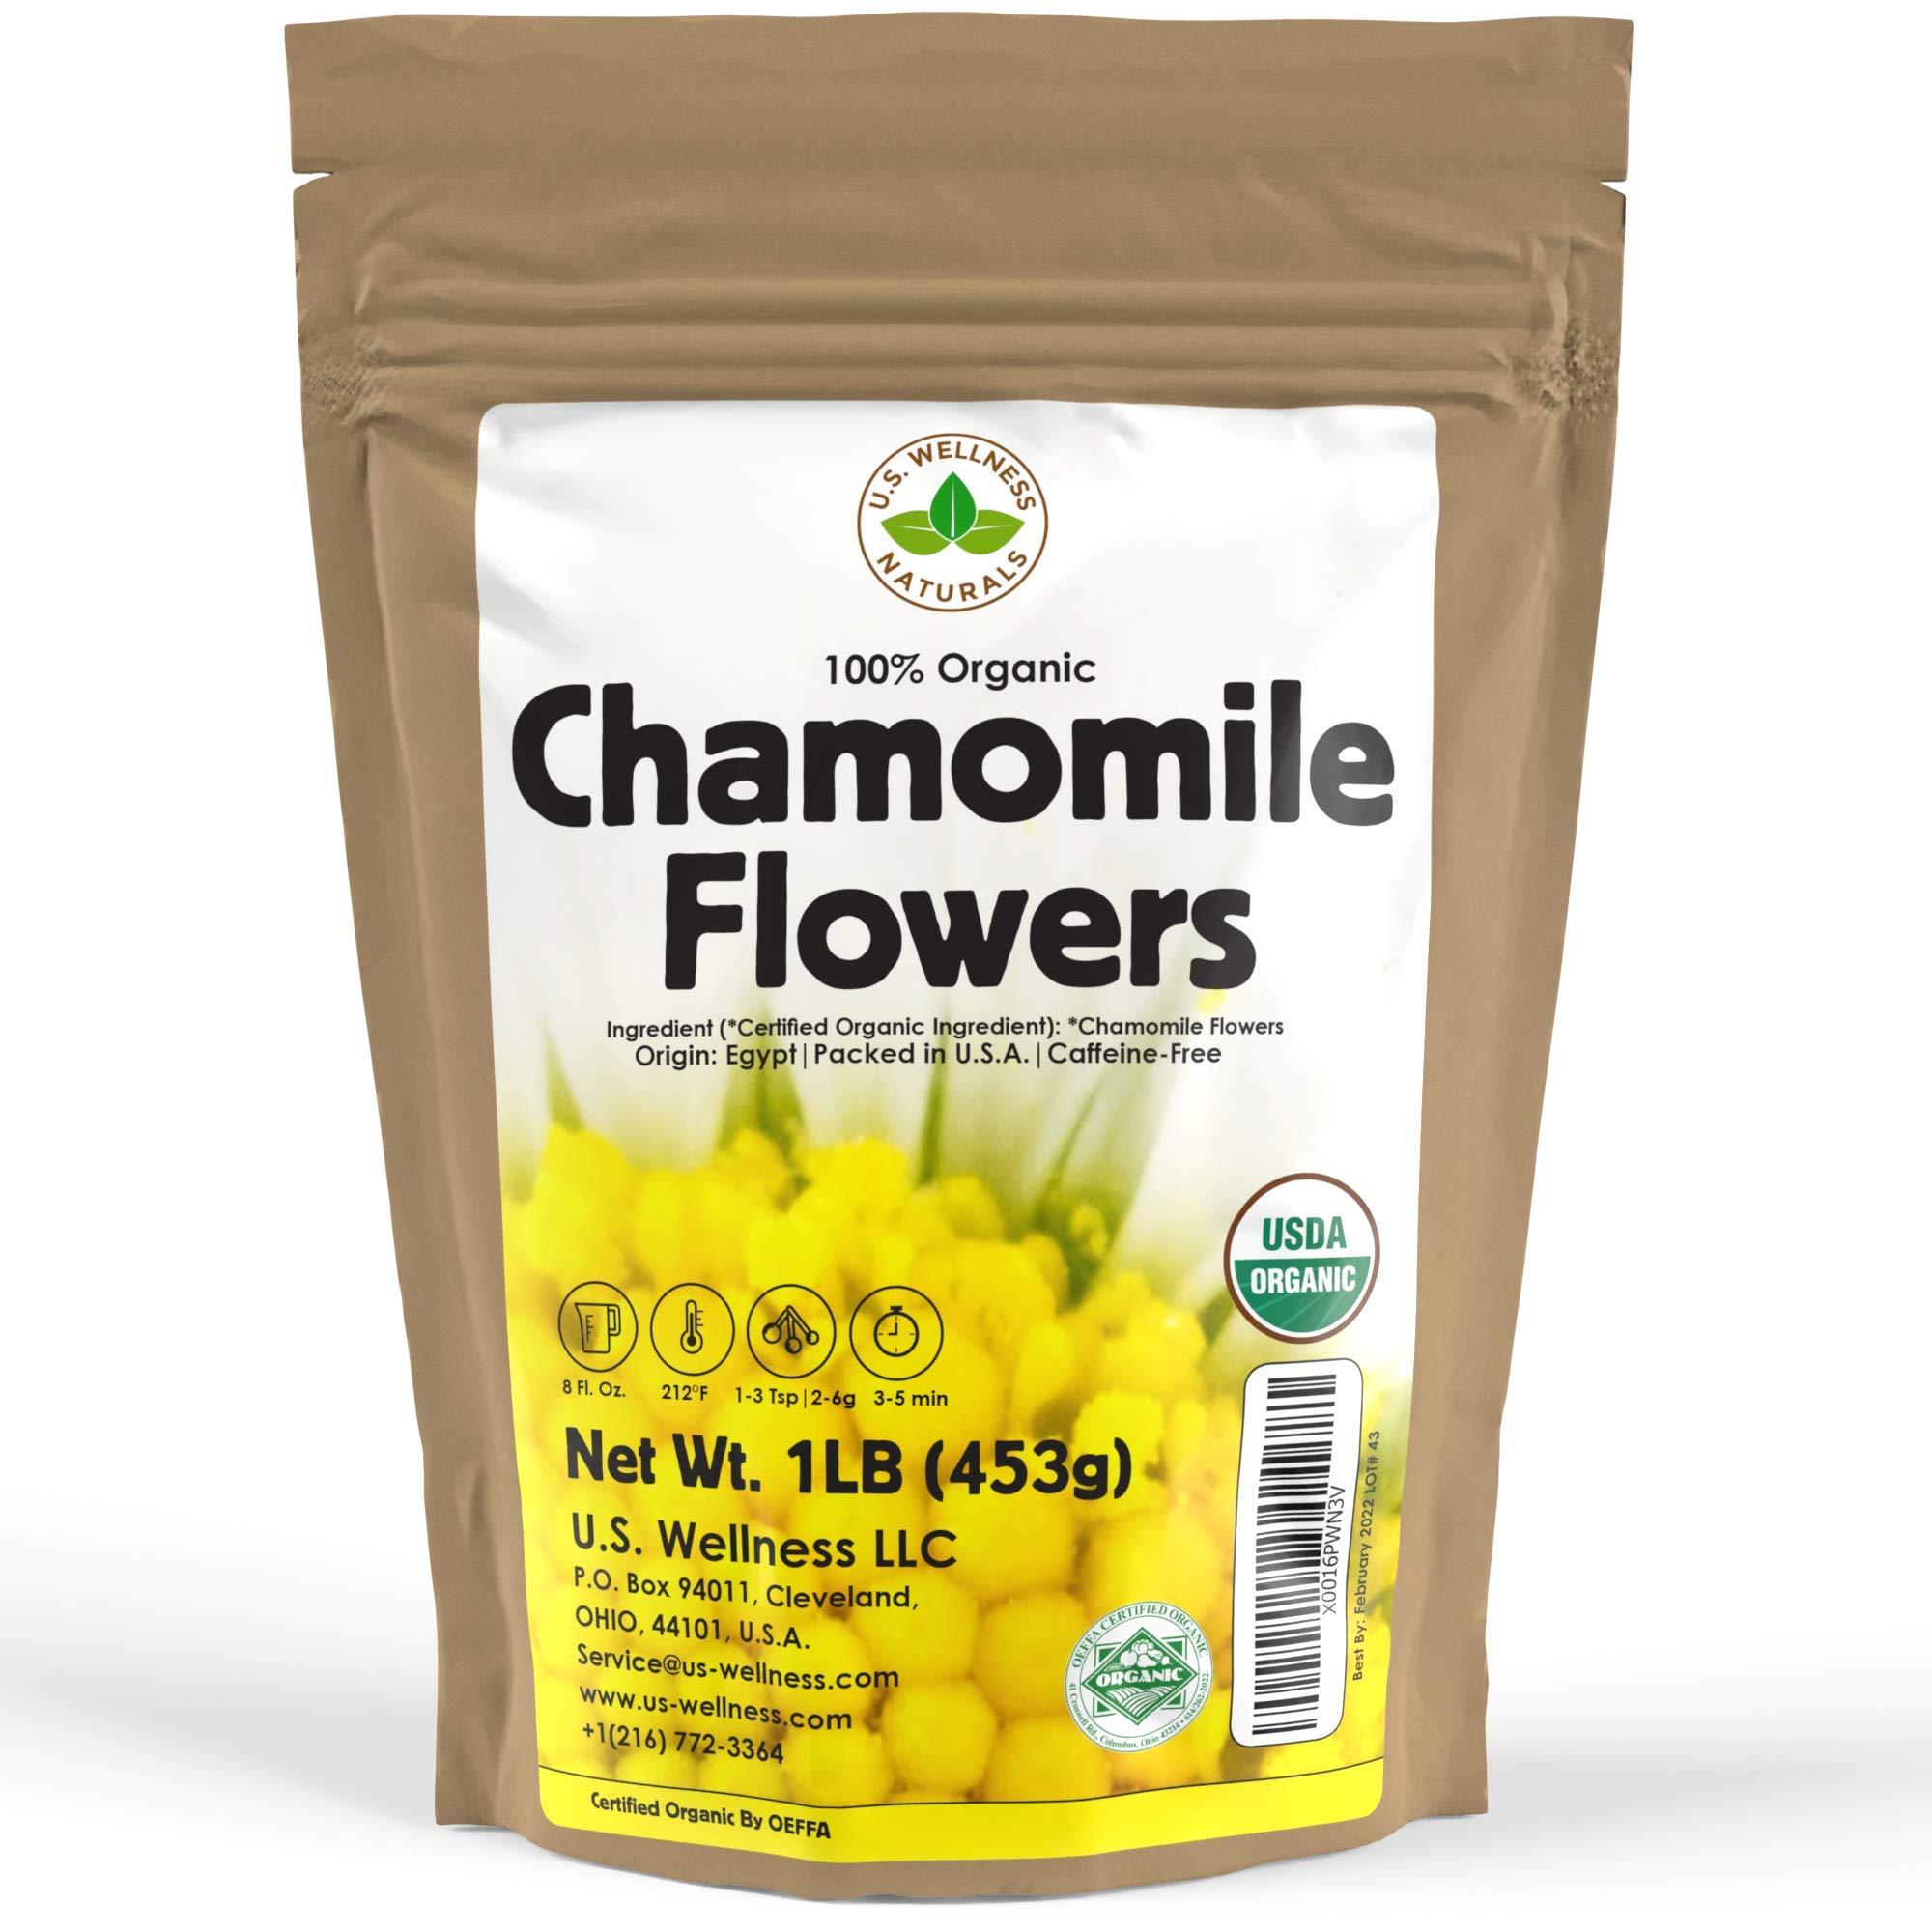 Chamomile Tea 1LB (16Oz) 100% CERTIFIED Organic (USDA seal) Chamomile Flowers Herbal Tea (Matricaria Chamomilla) in 1 lb Bulk Kraft BPA free Resealable Bags from U.S. Wellness by U.S. Wellness Naturals